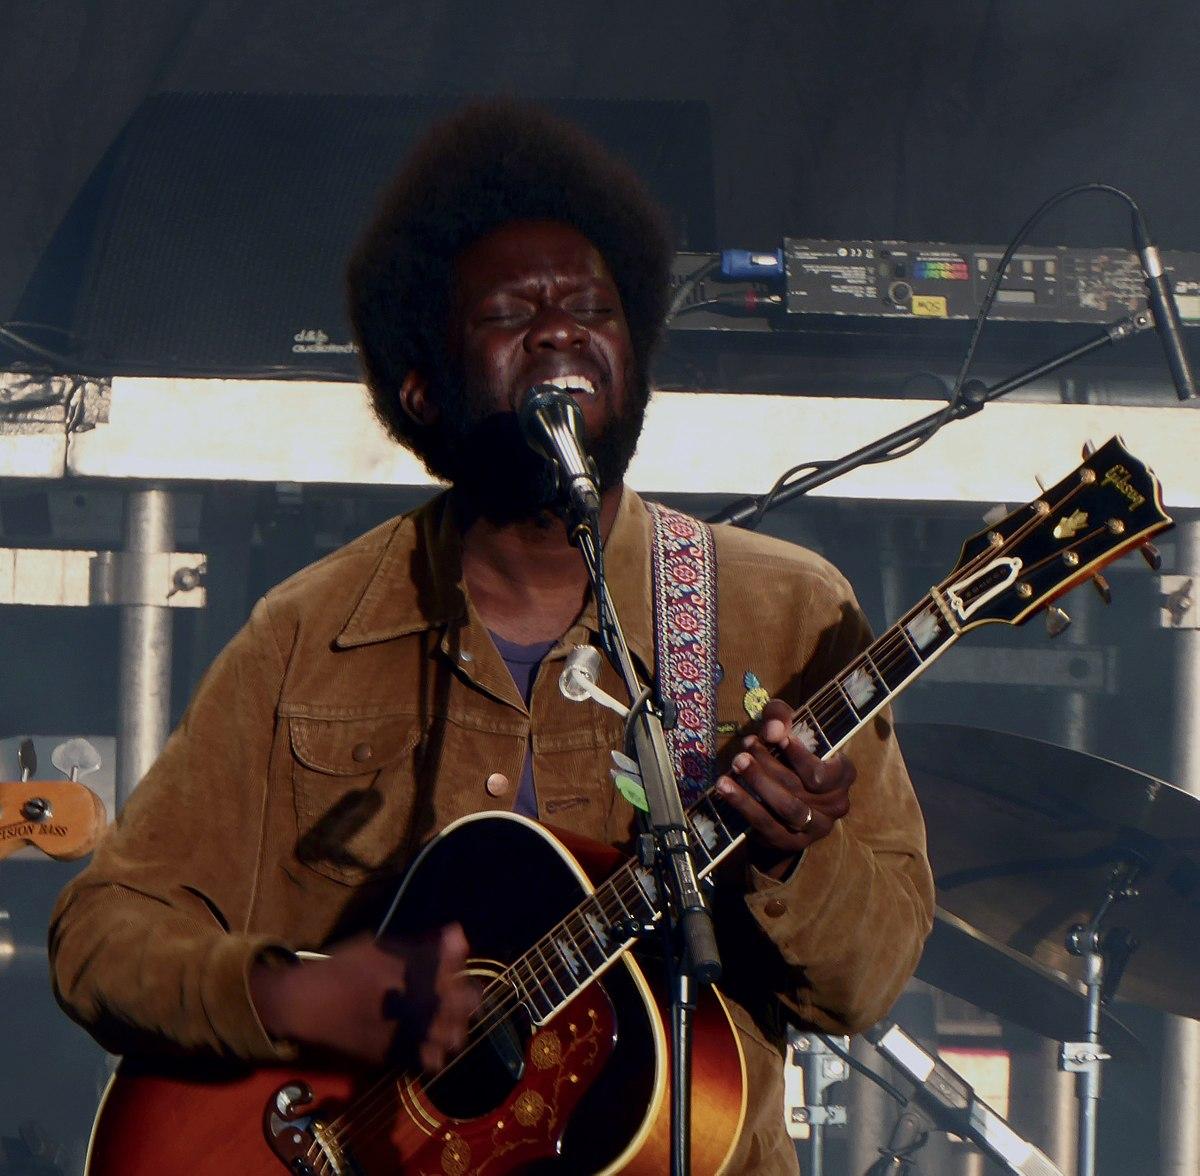 Montreux Jazz Festival >> Michael Kiwanuka - Wikipedia